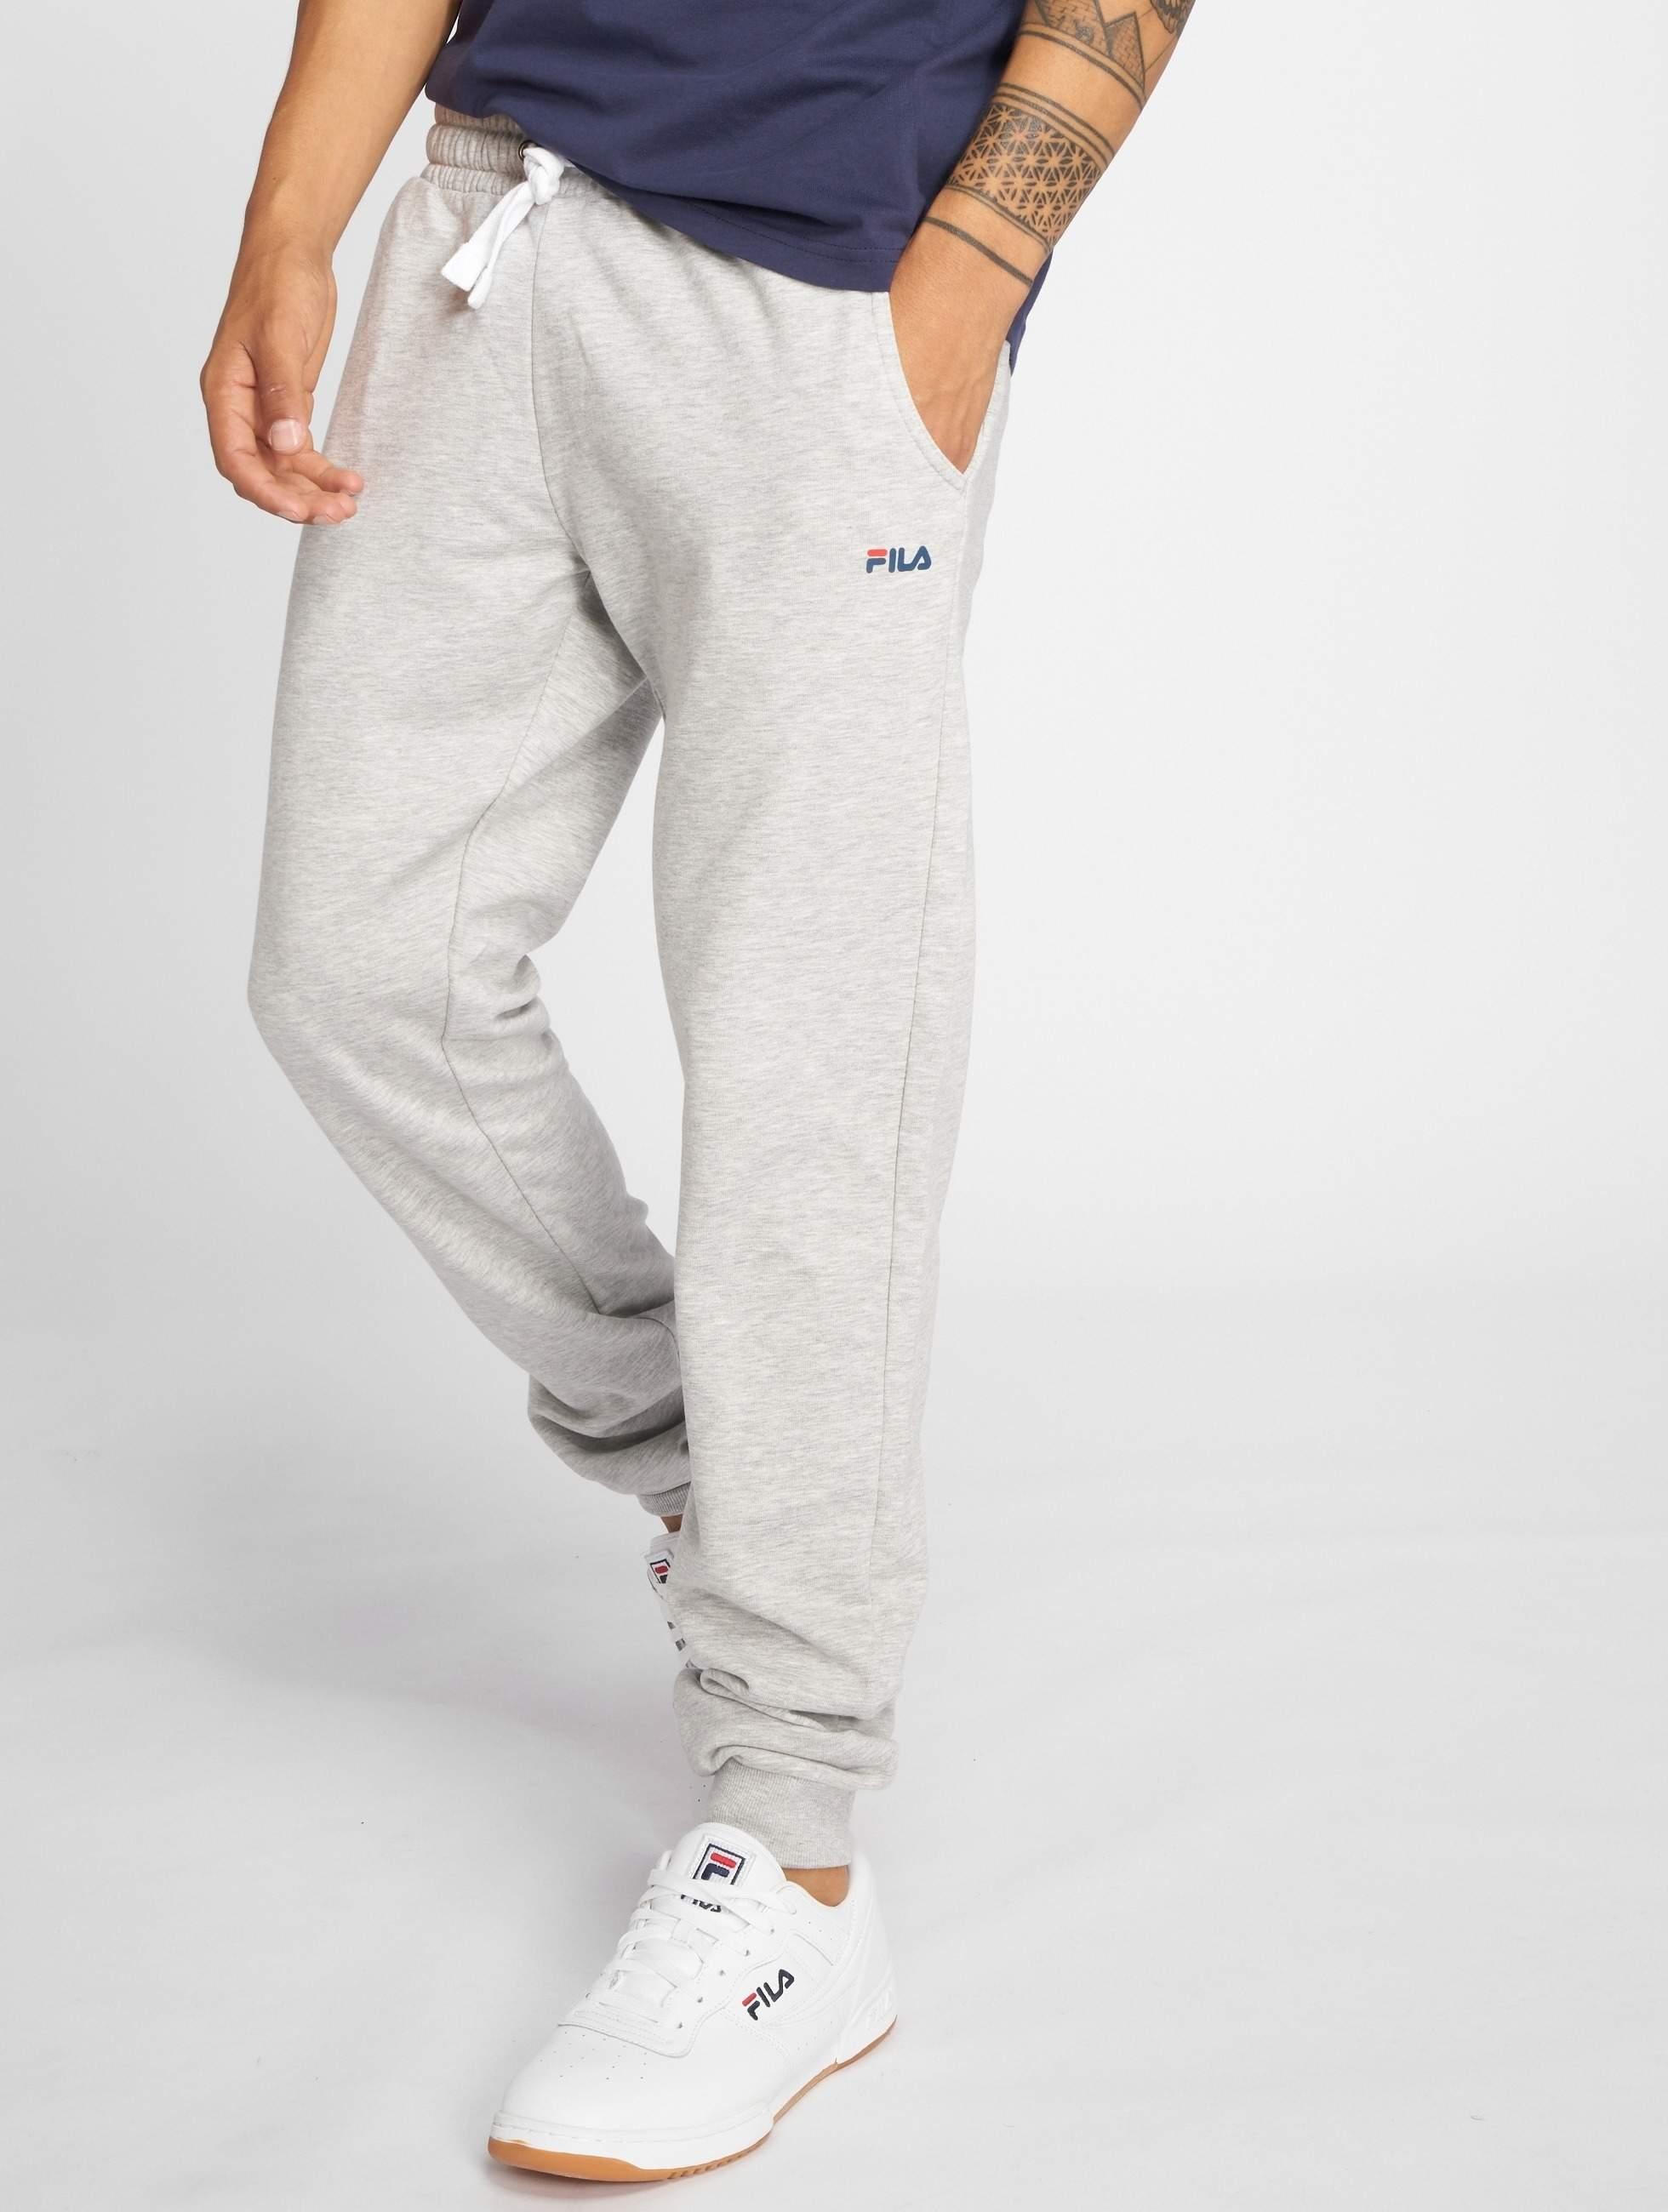 ad7ce6f8fc4 FILA broek / joggingbroek Classic Slim Pants in grijs 509539